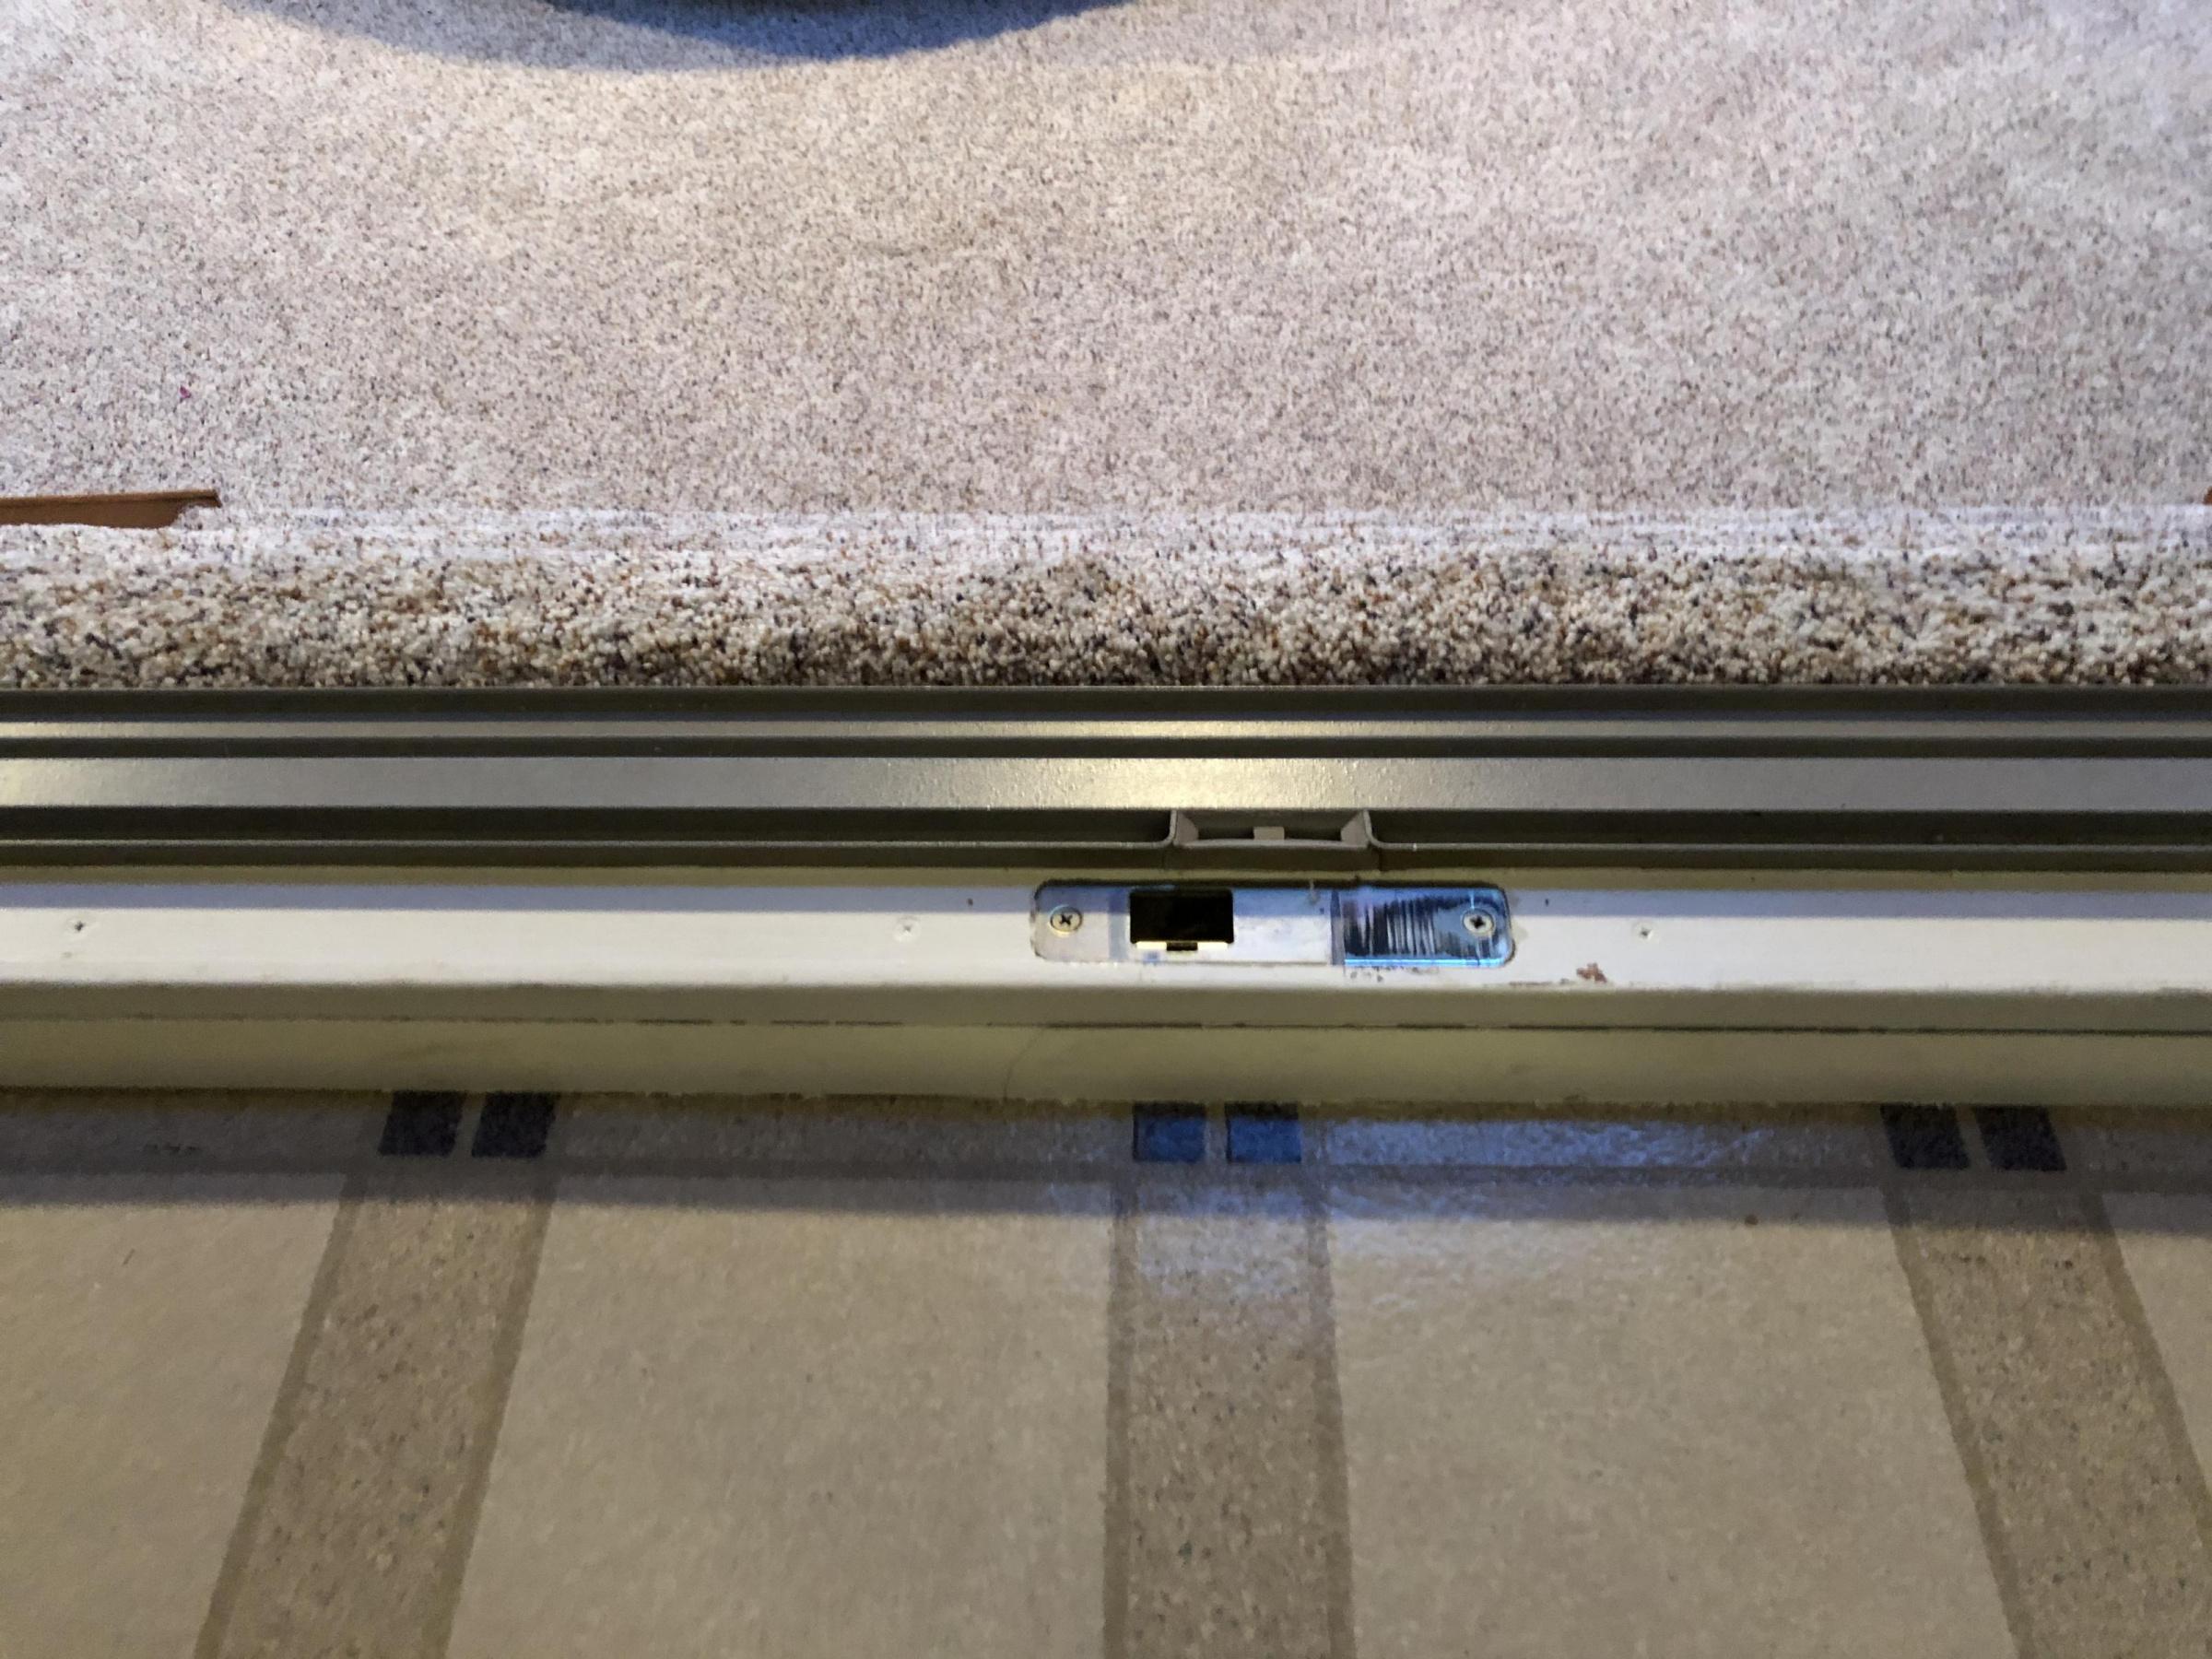 Door Floor Plate Transition ideas-78208eb1-3b6b-4da7-8b42-853461ba137d_1578921764017.jpg